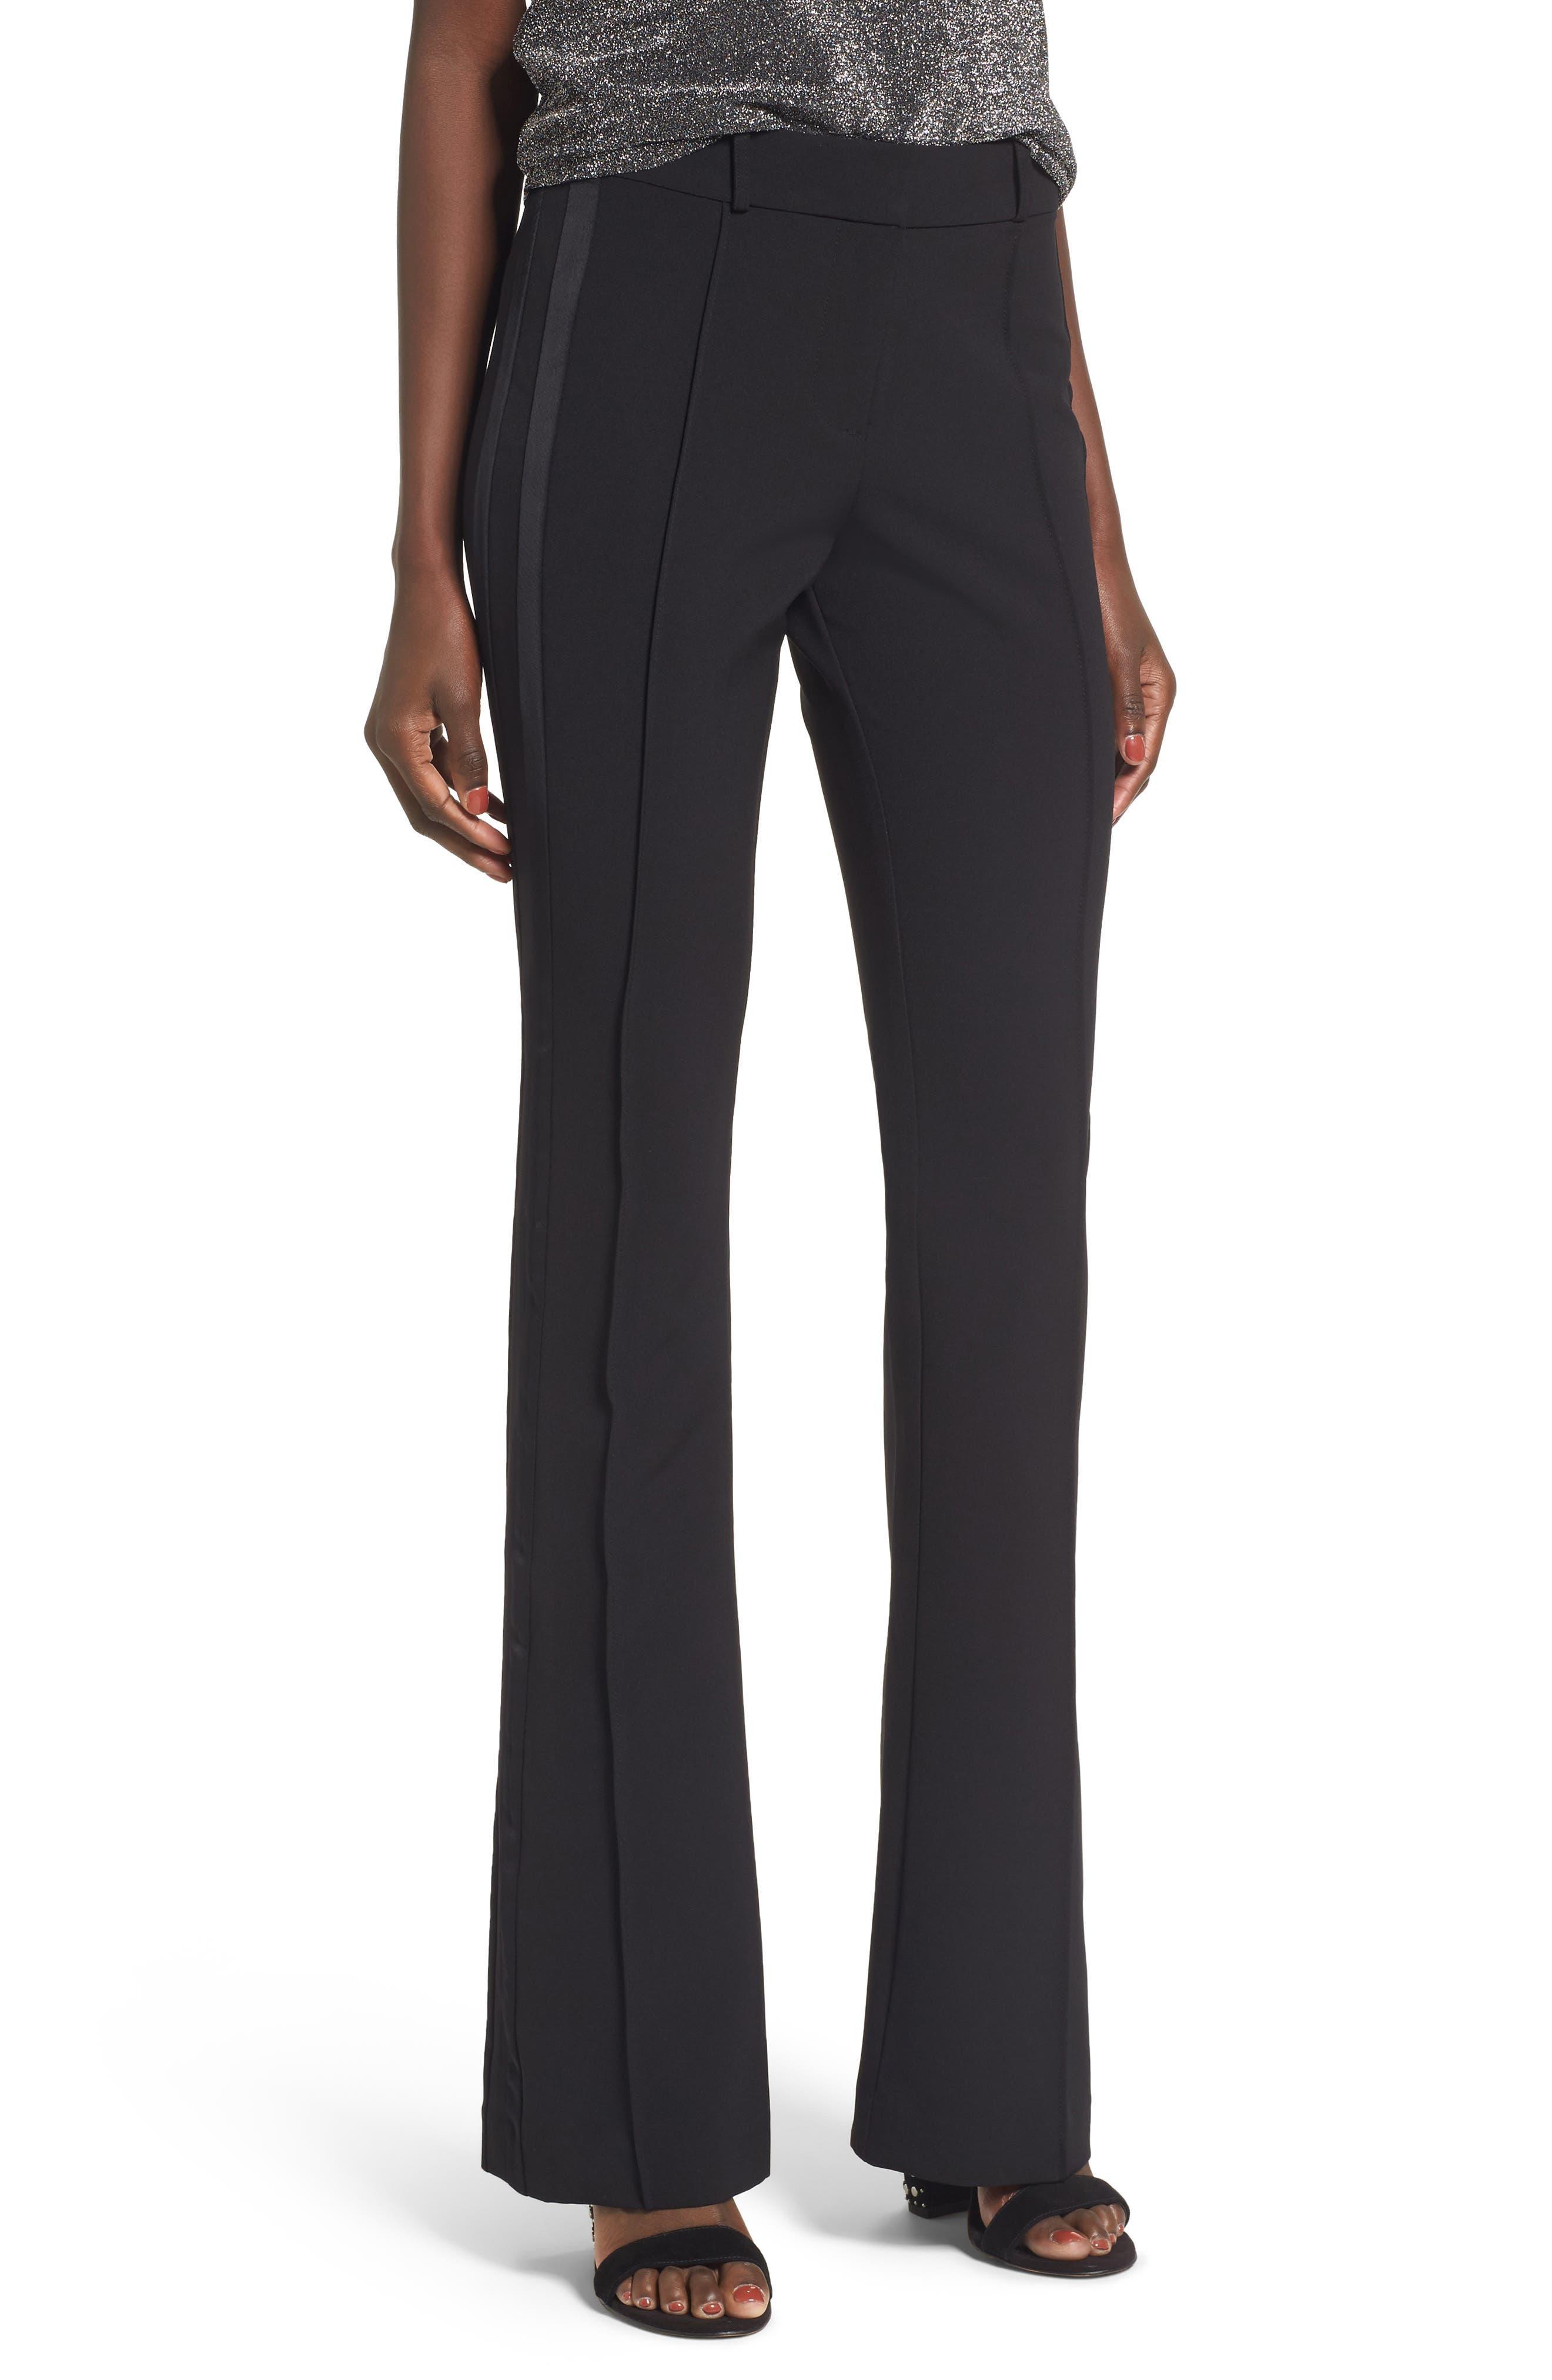 Roxy Flare Leg Pants,                         Main,                         color, Black